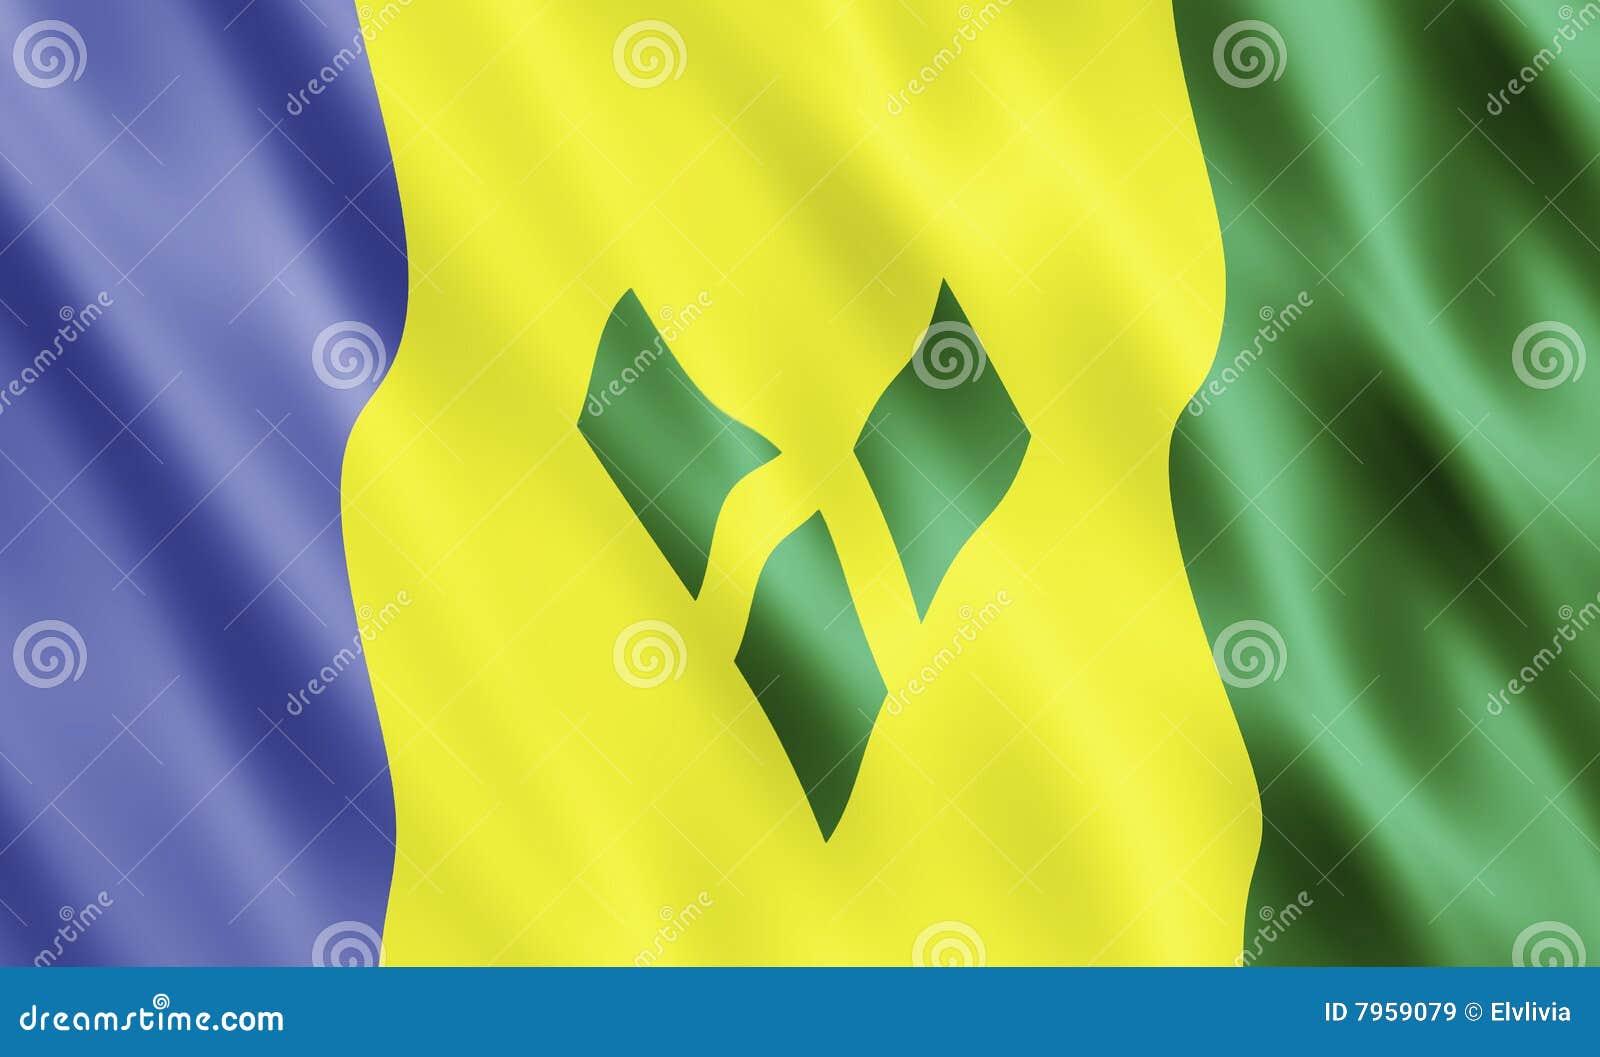 Str. Vincent u. die Grenadinen